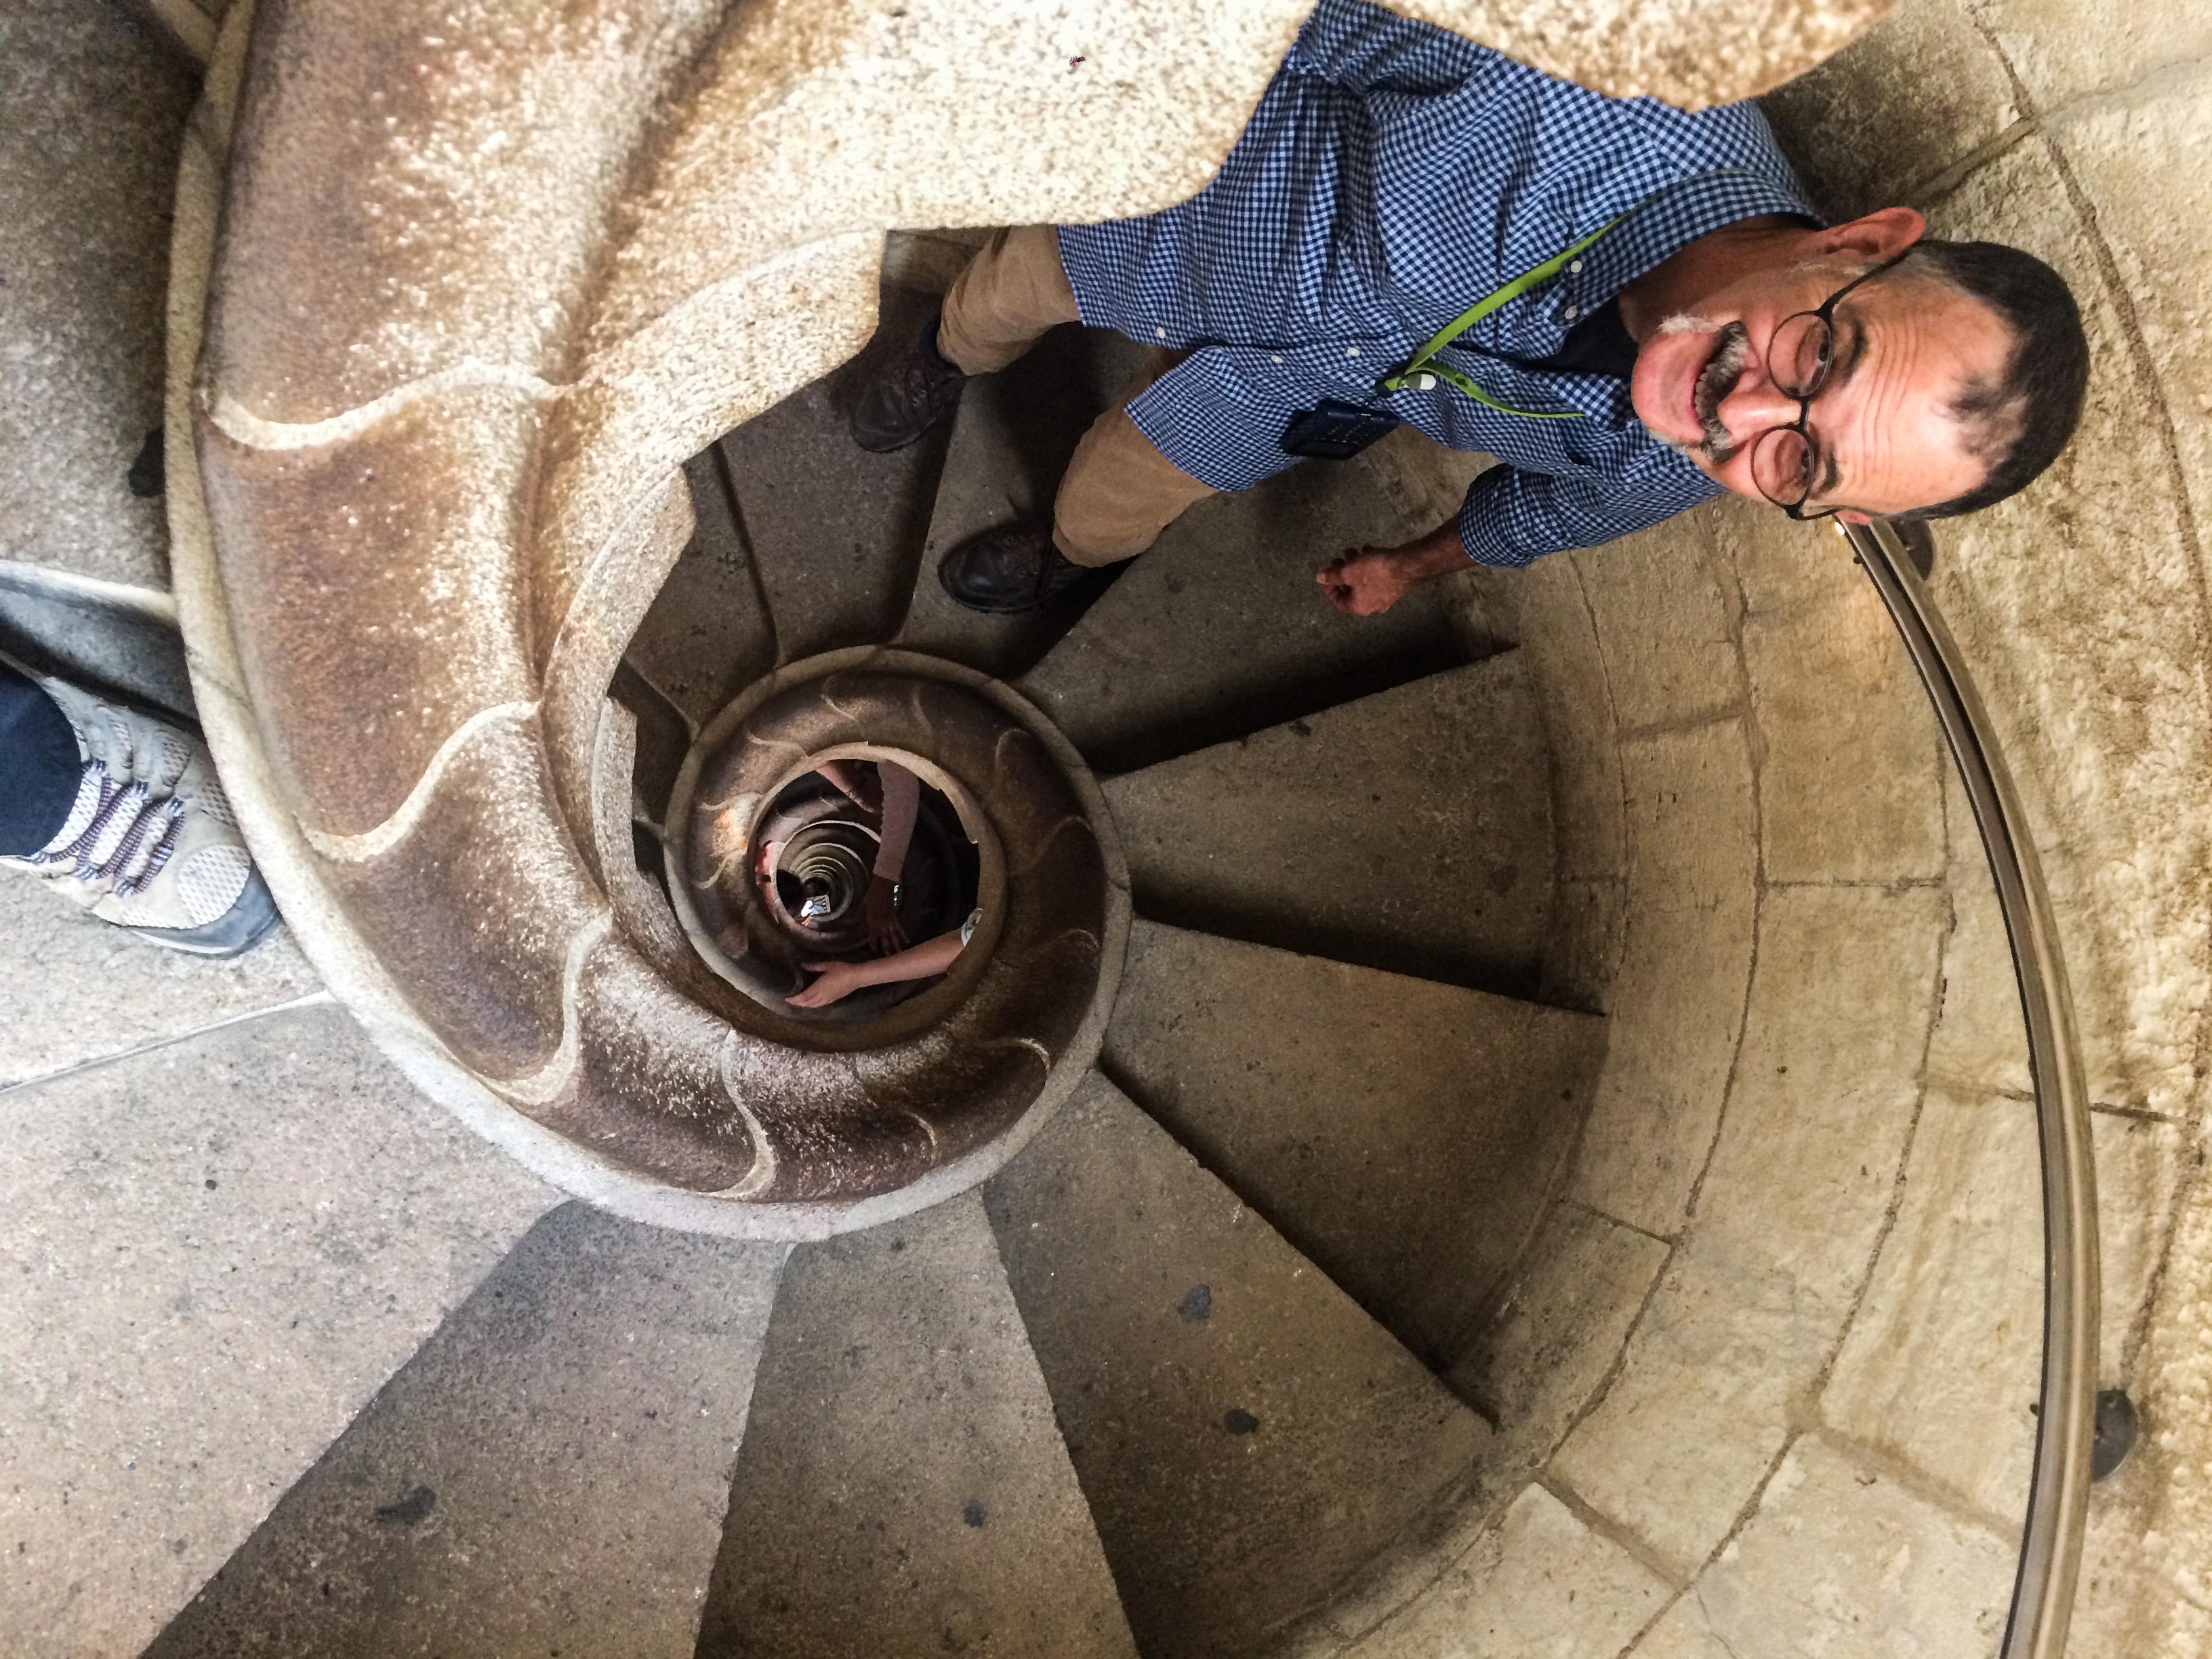 MontaraManDan descends from the north tower at Sagrada Familia, Barcelona. Dawn Page/Coastside Slacking